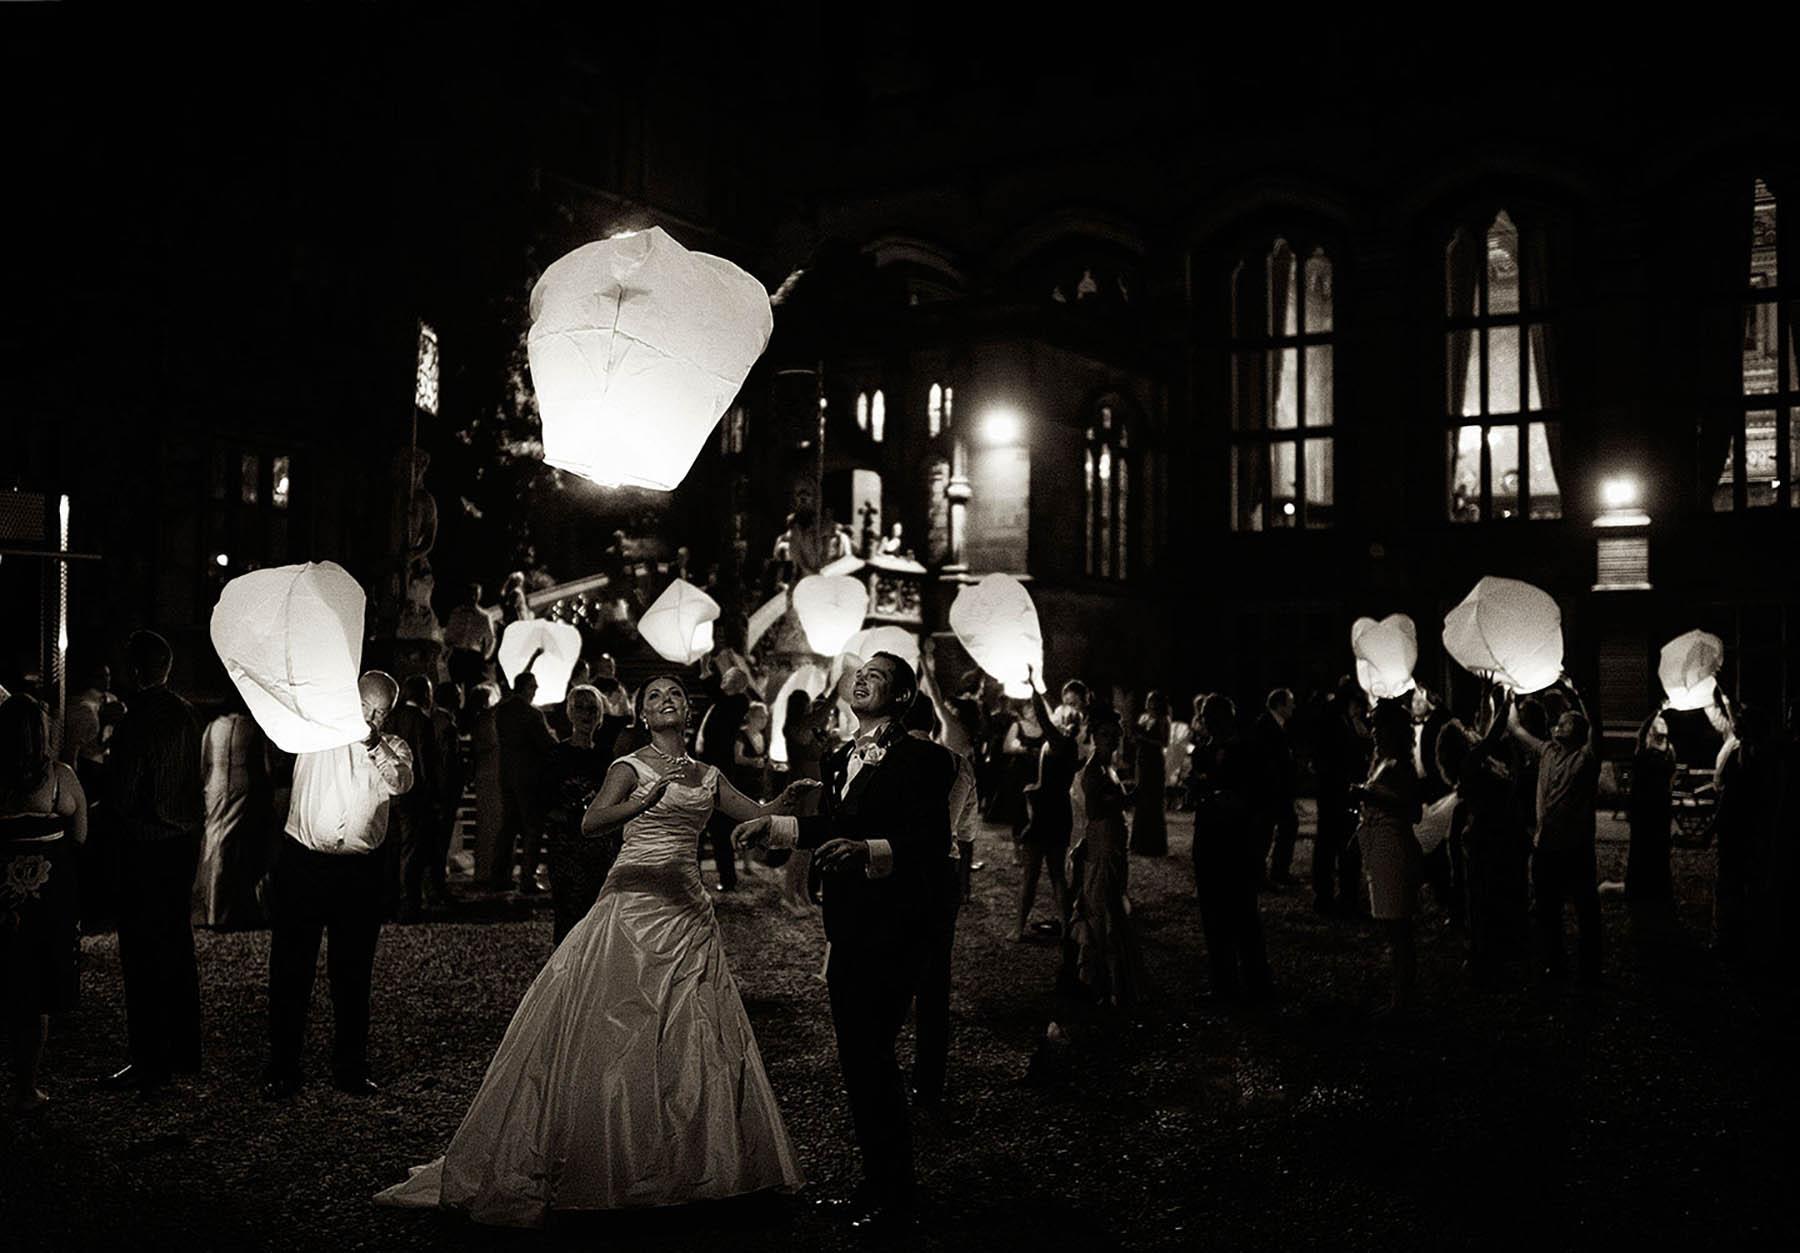 carlton-towers-wedding-photographer-yorkshire-portraits-copyright.jpg